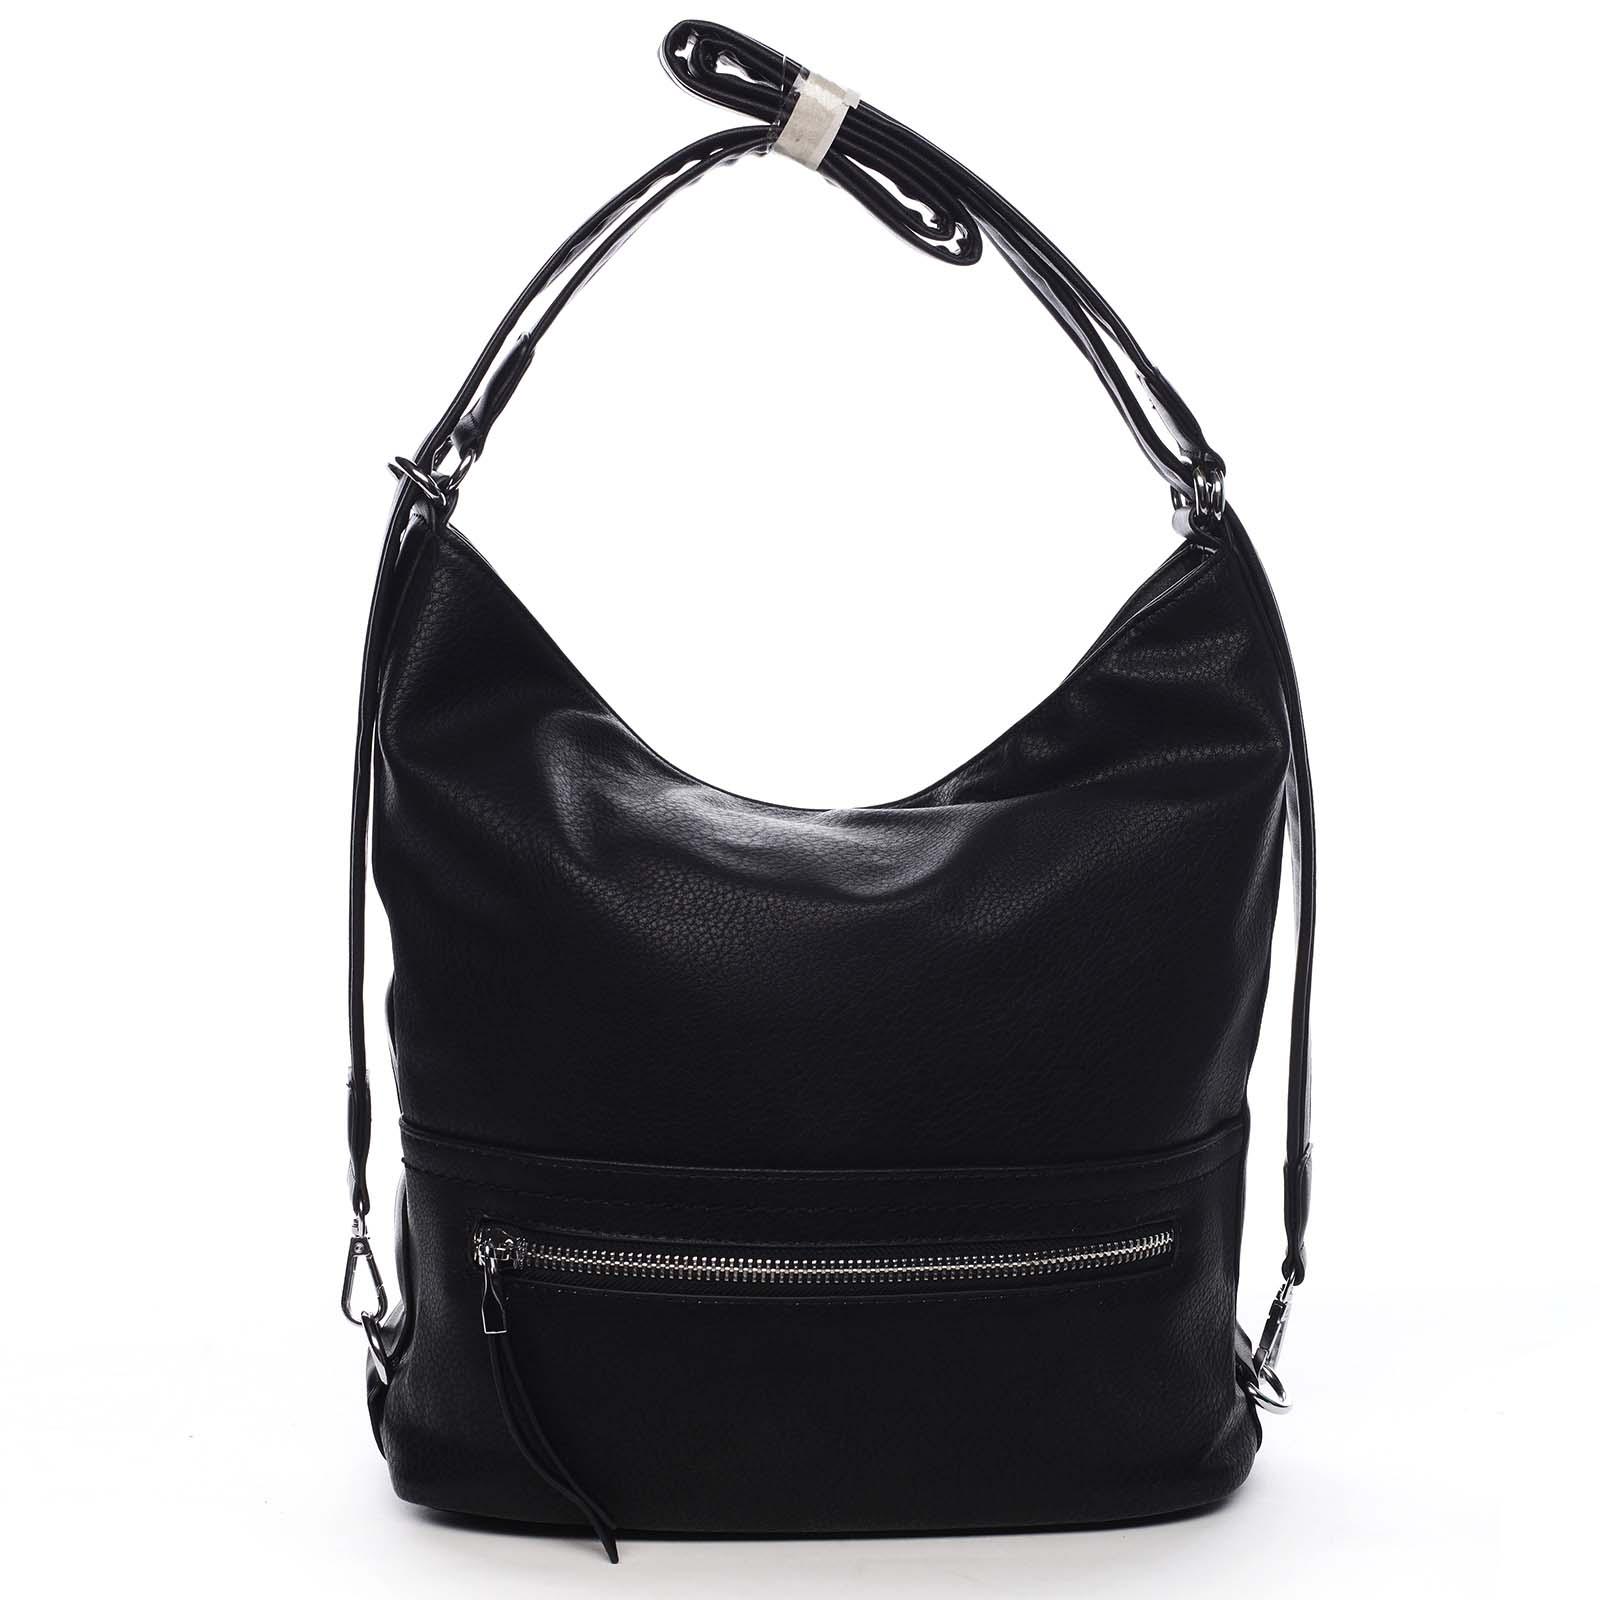 Dámska kabelka čierna - Romina Nikka čierna